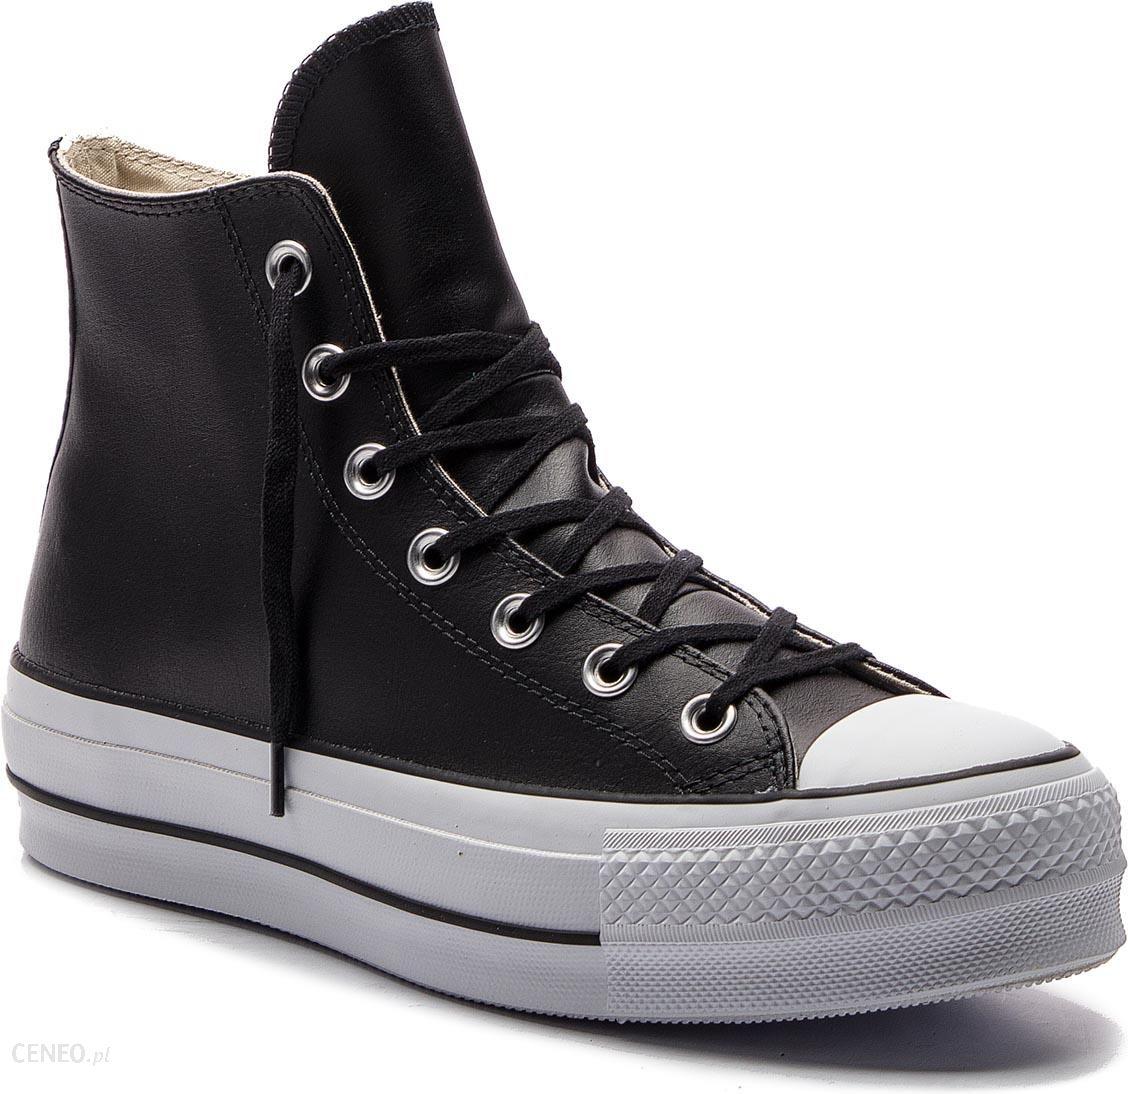 61d62d9e81ec1 Trampki CONVERSE - Ctas Lift Clean Hi 561675C Black/Black/White - zdjęcie 1